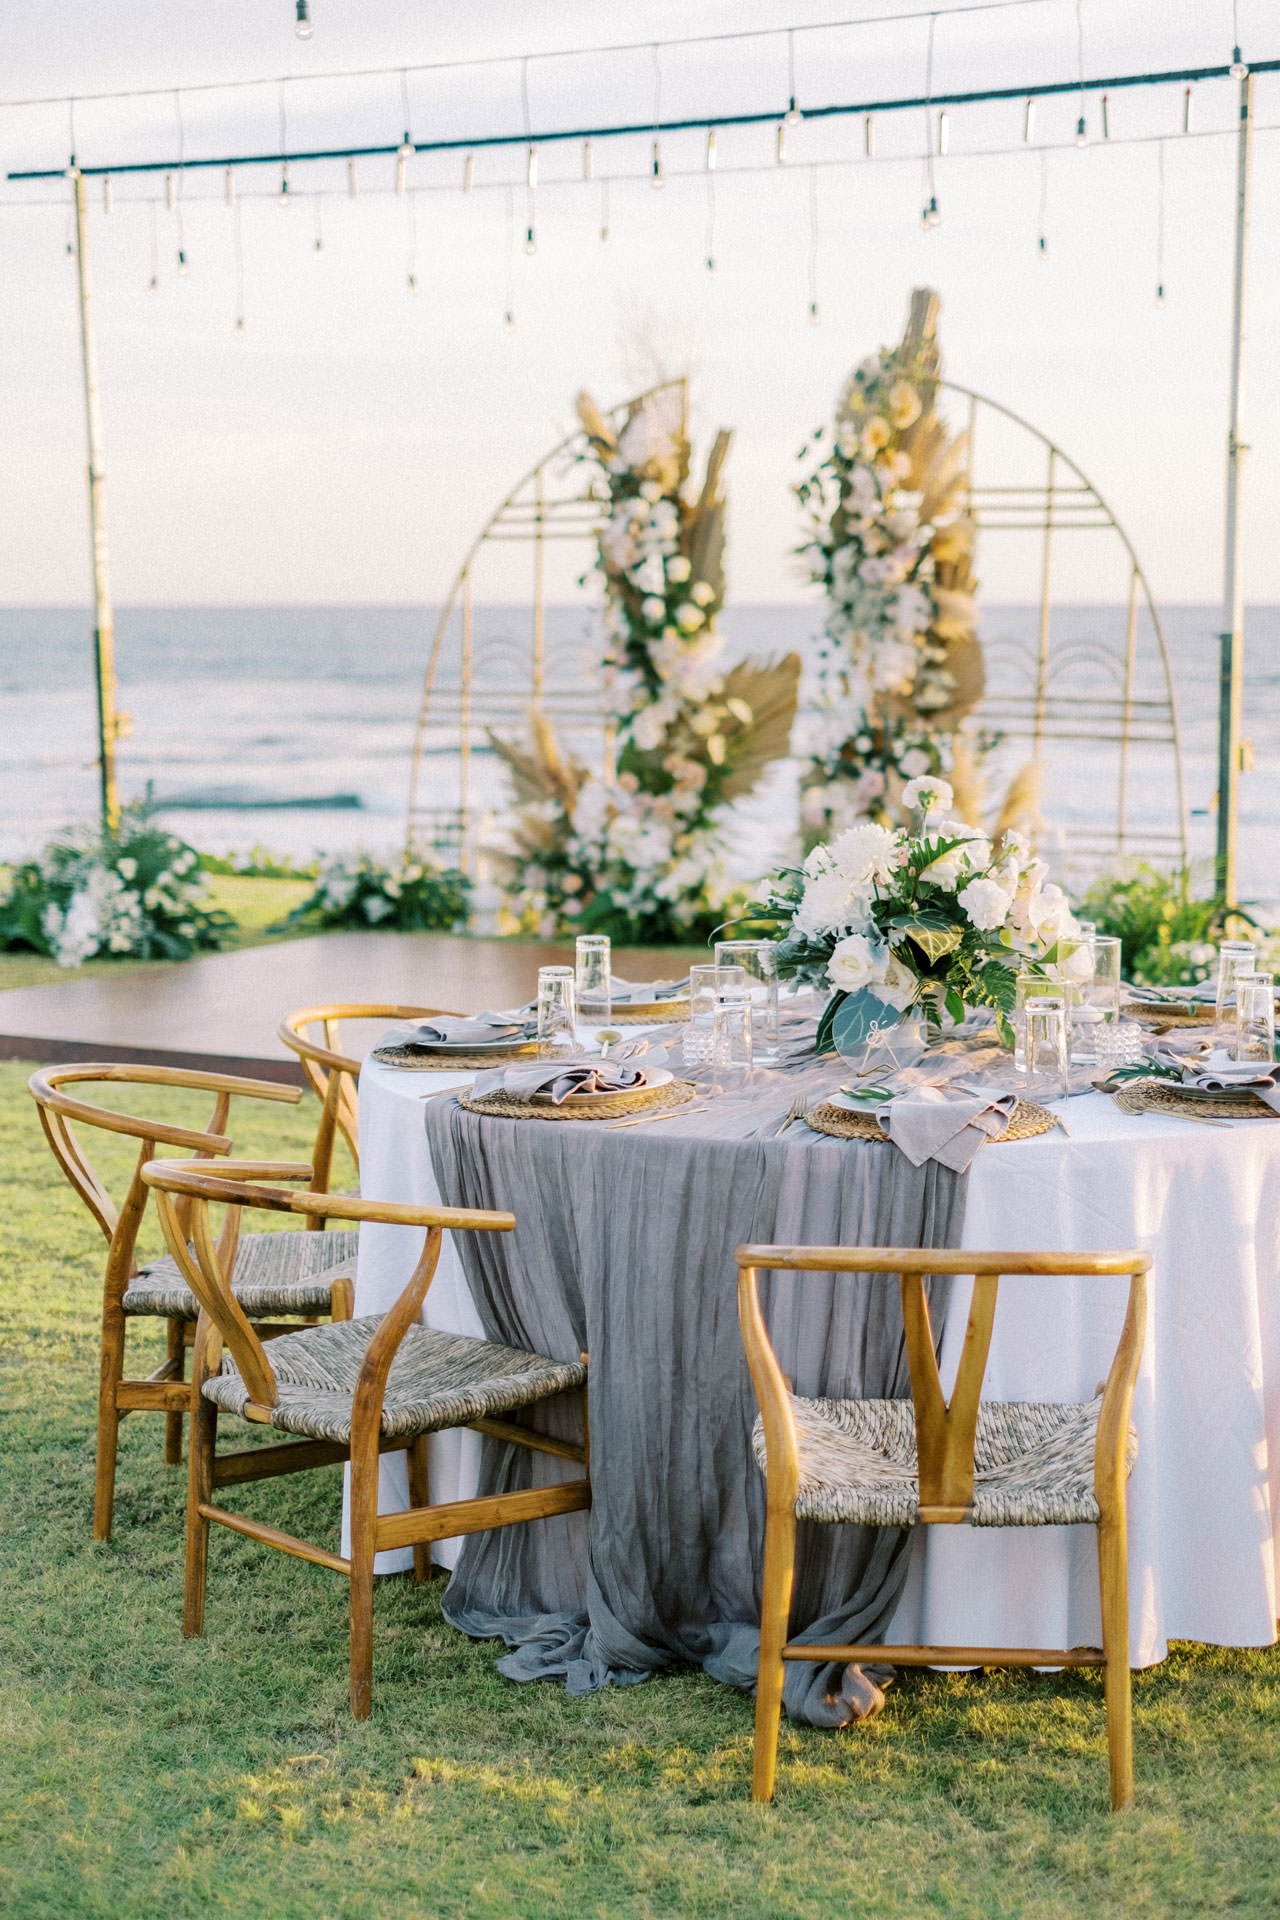 Bali Beach Glamping Wedding on a Luxury Tent 50